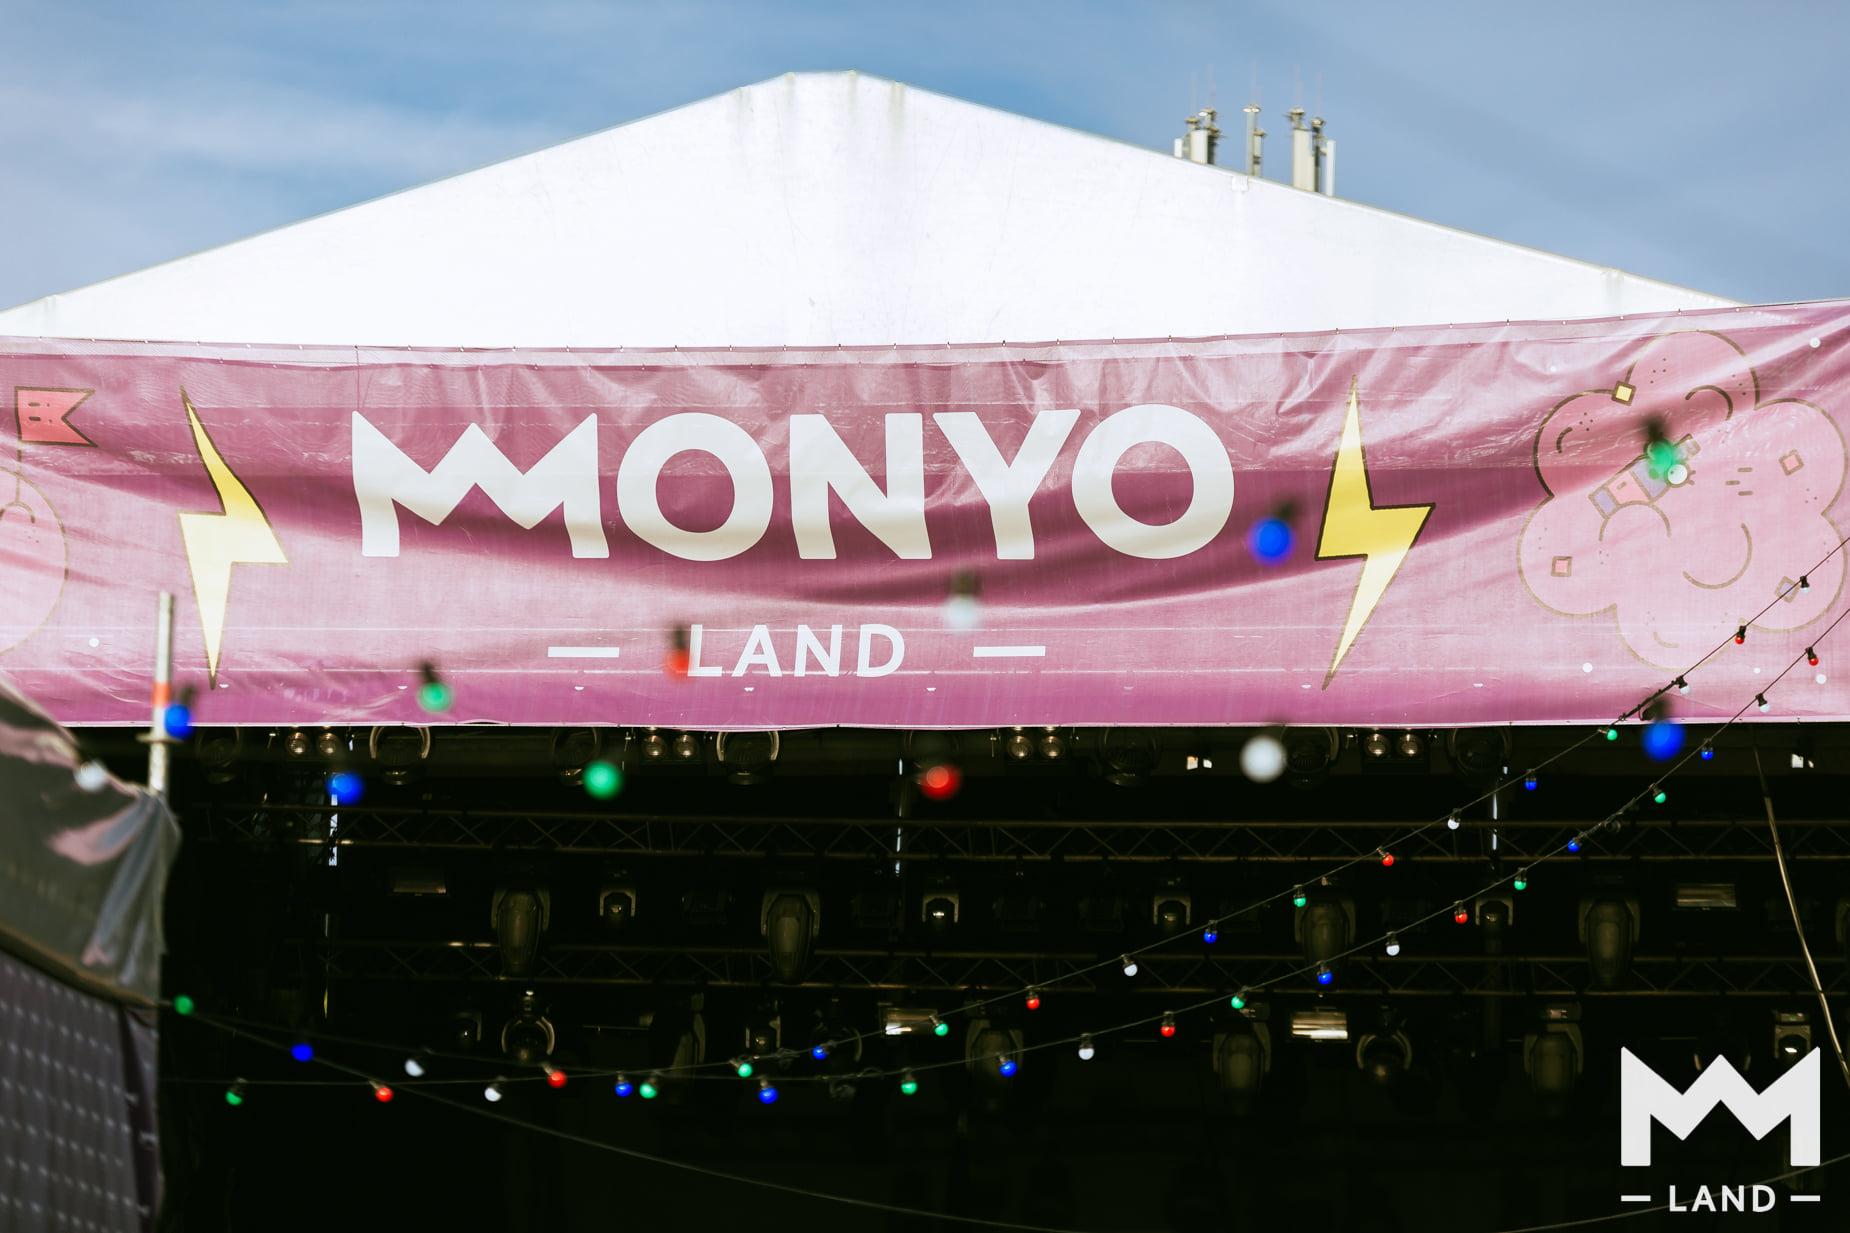 monyo_l.jpg